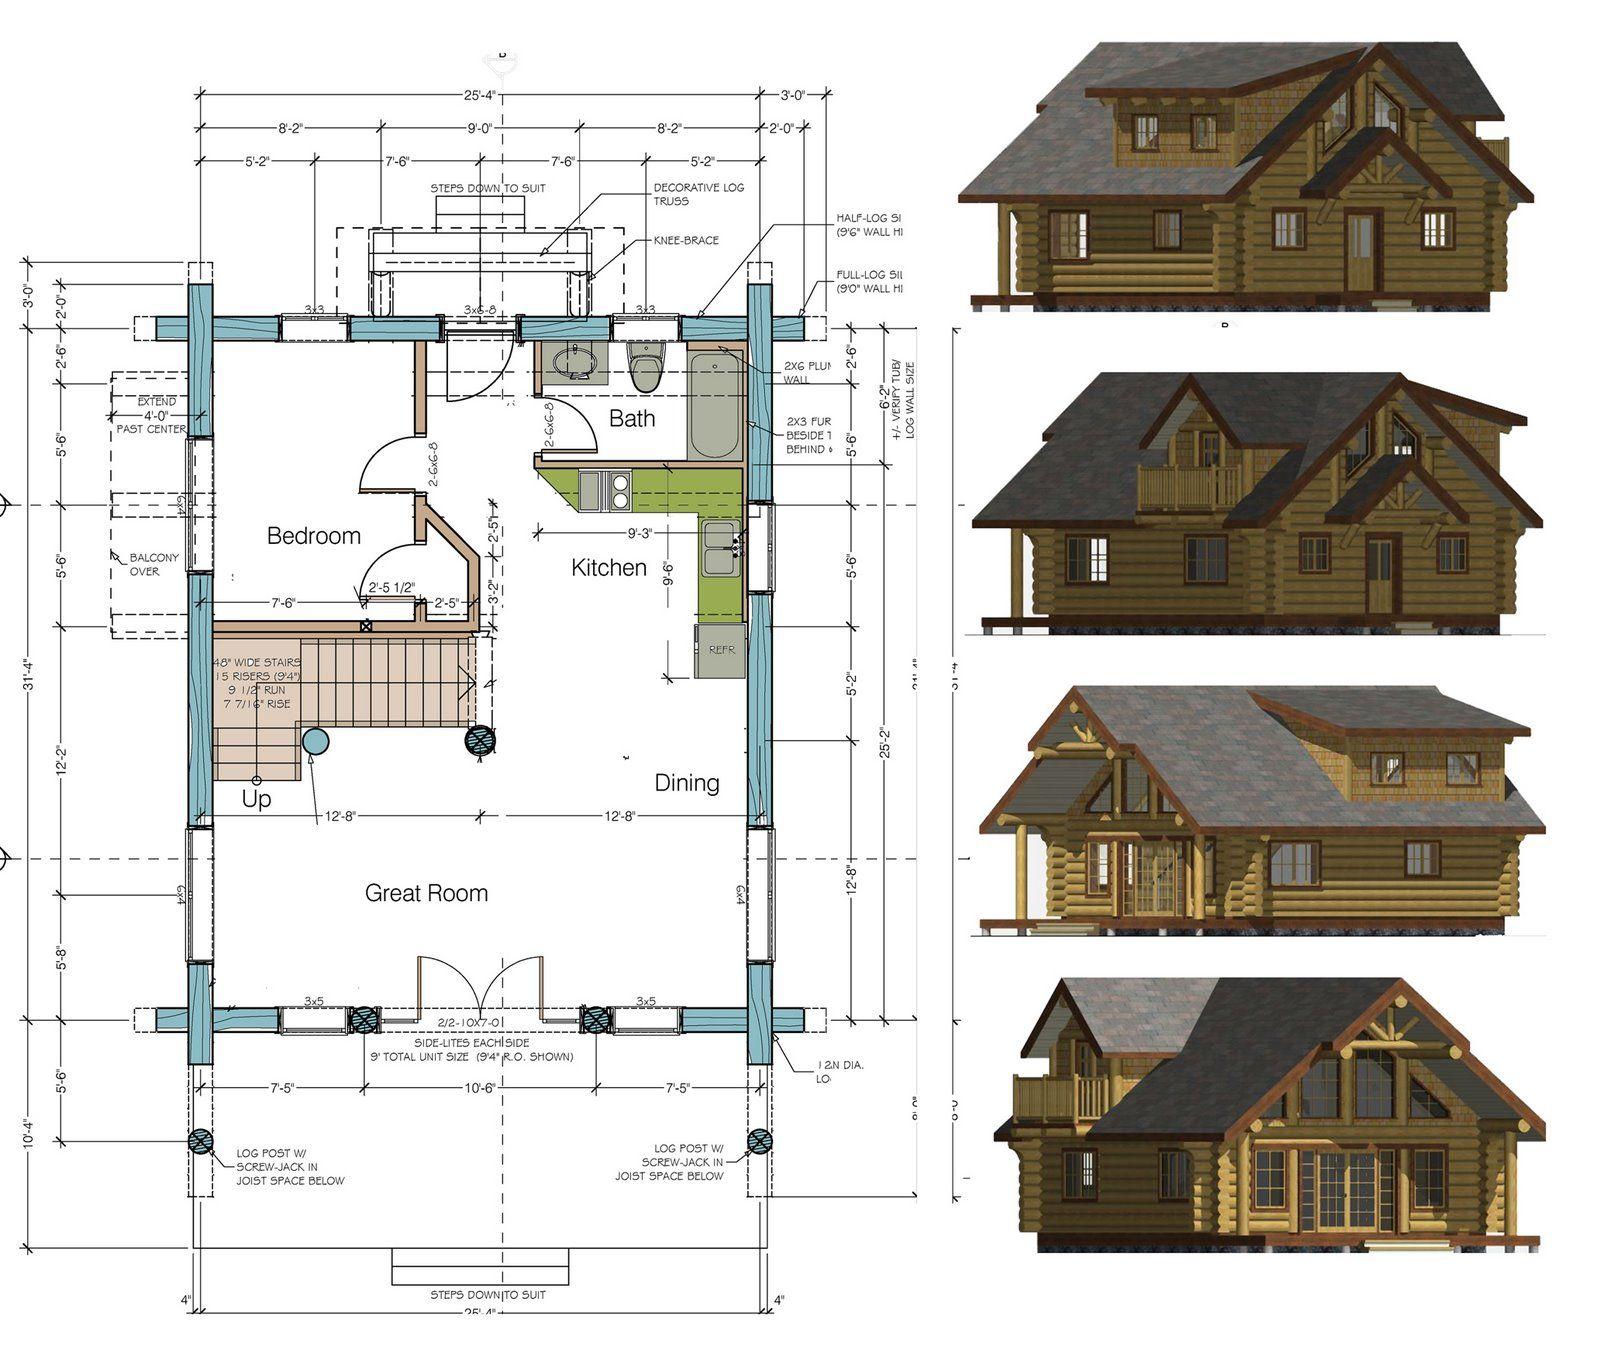 House Exterior Design Software Online